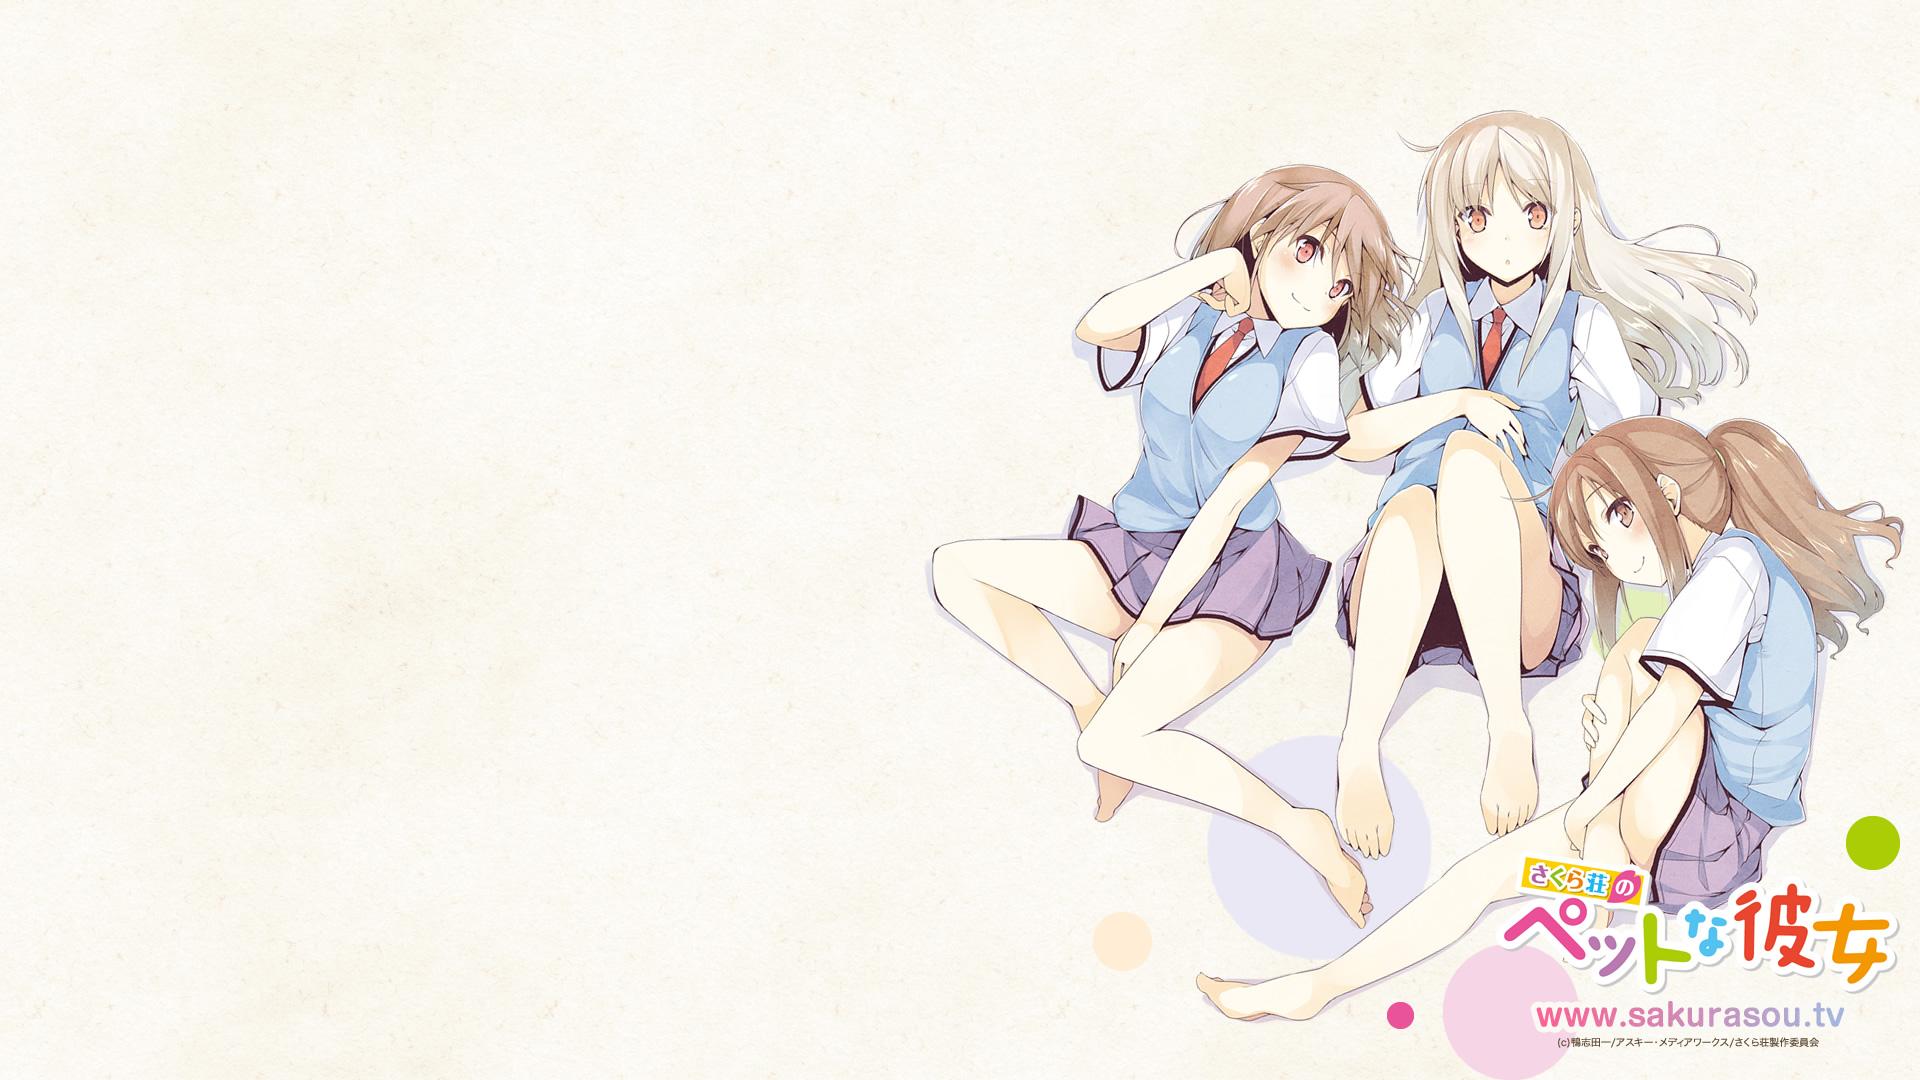 Special さくら荘のペットな彼女 アニメ公式サイト